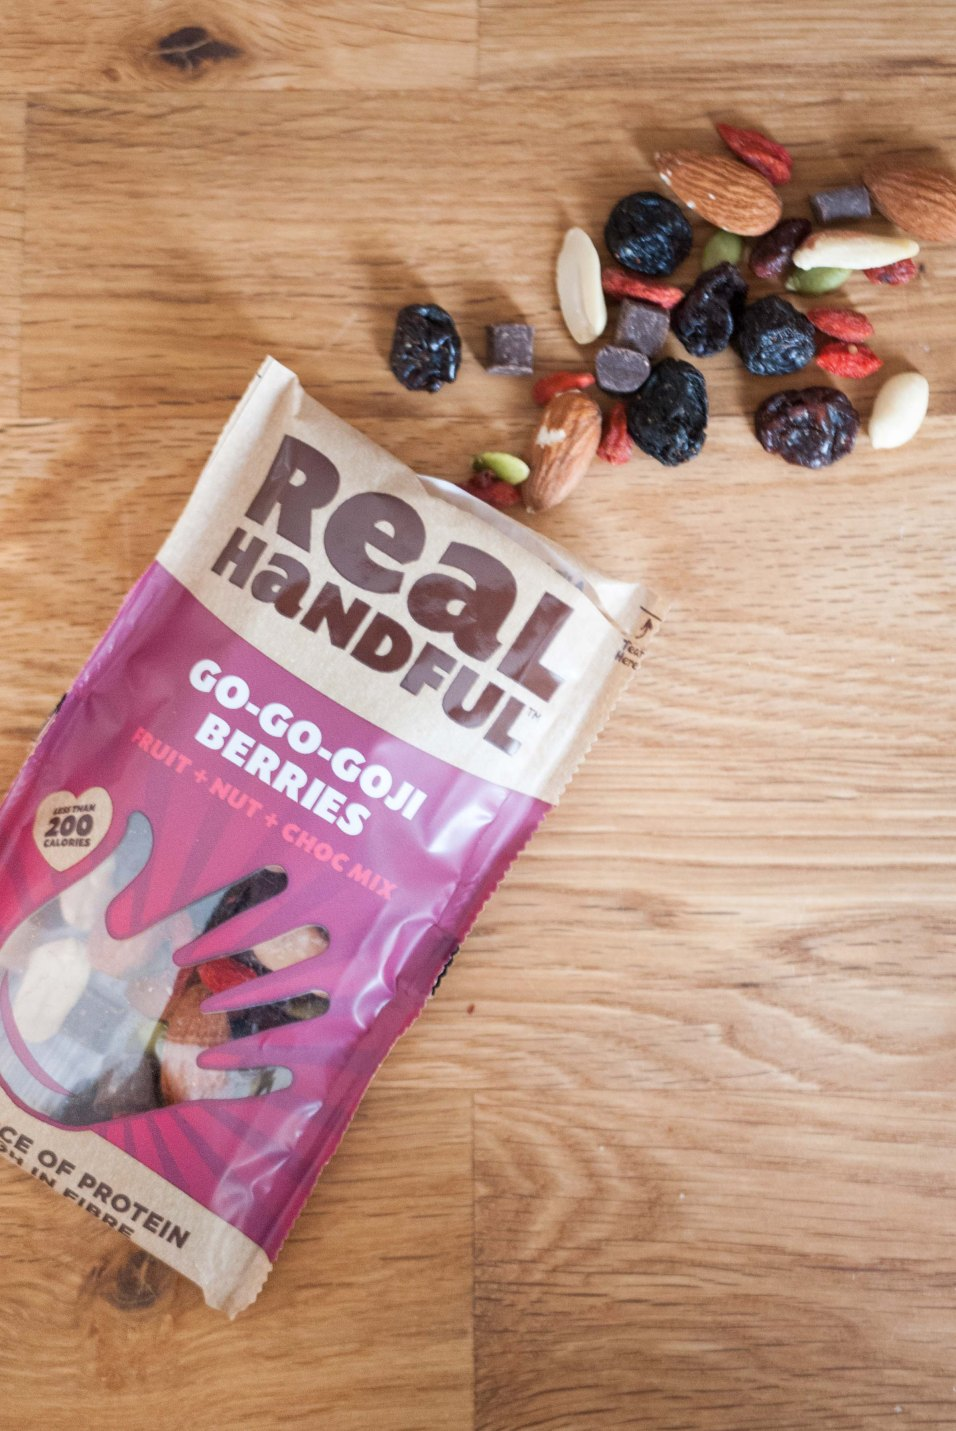 Real Handful's Go-Go-Goji Berries